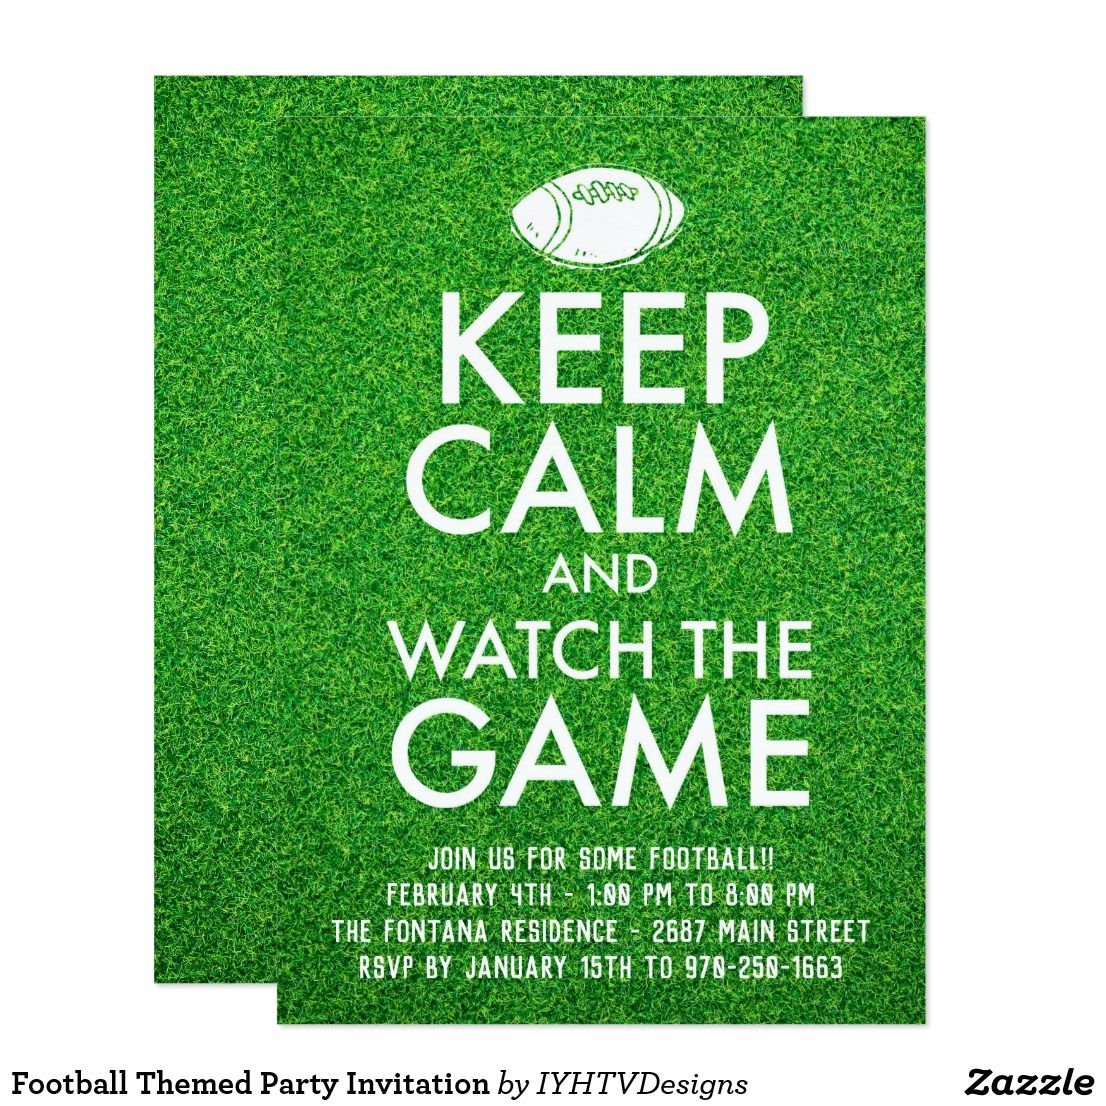 Football Themed Party Invitation | Football themed parties, Themed ...